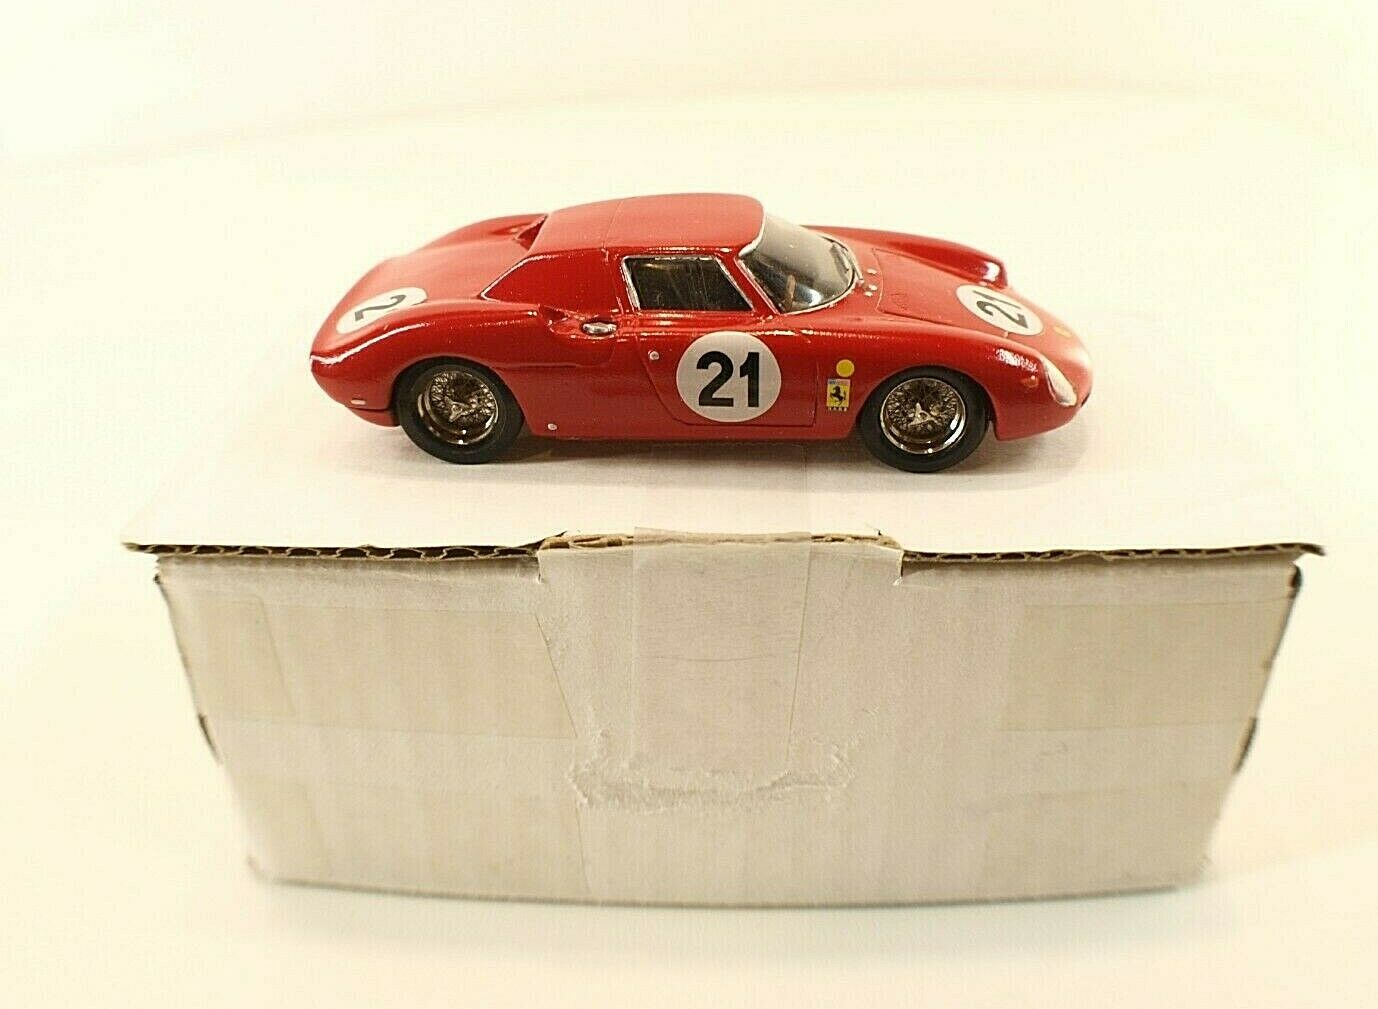 Bam ferrari 250 le mans 1965 nº 21 metal kit mounted magnificent 1 43